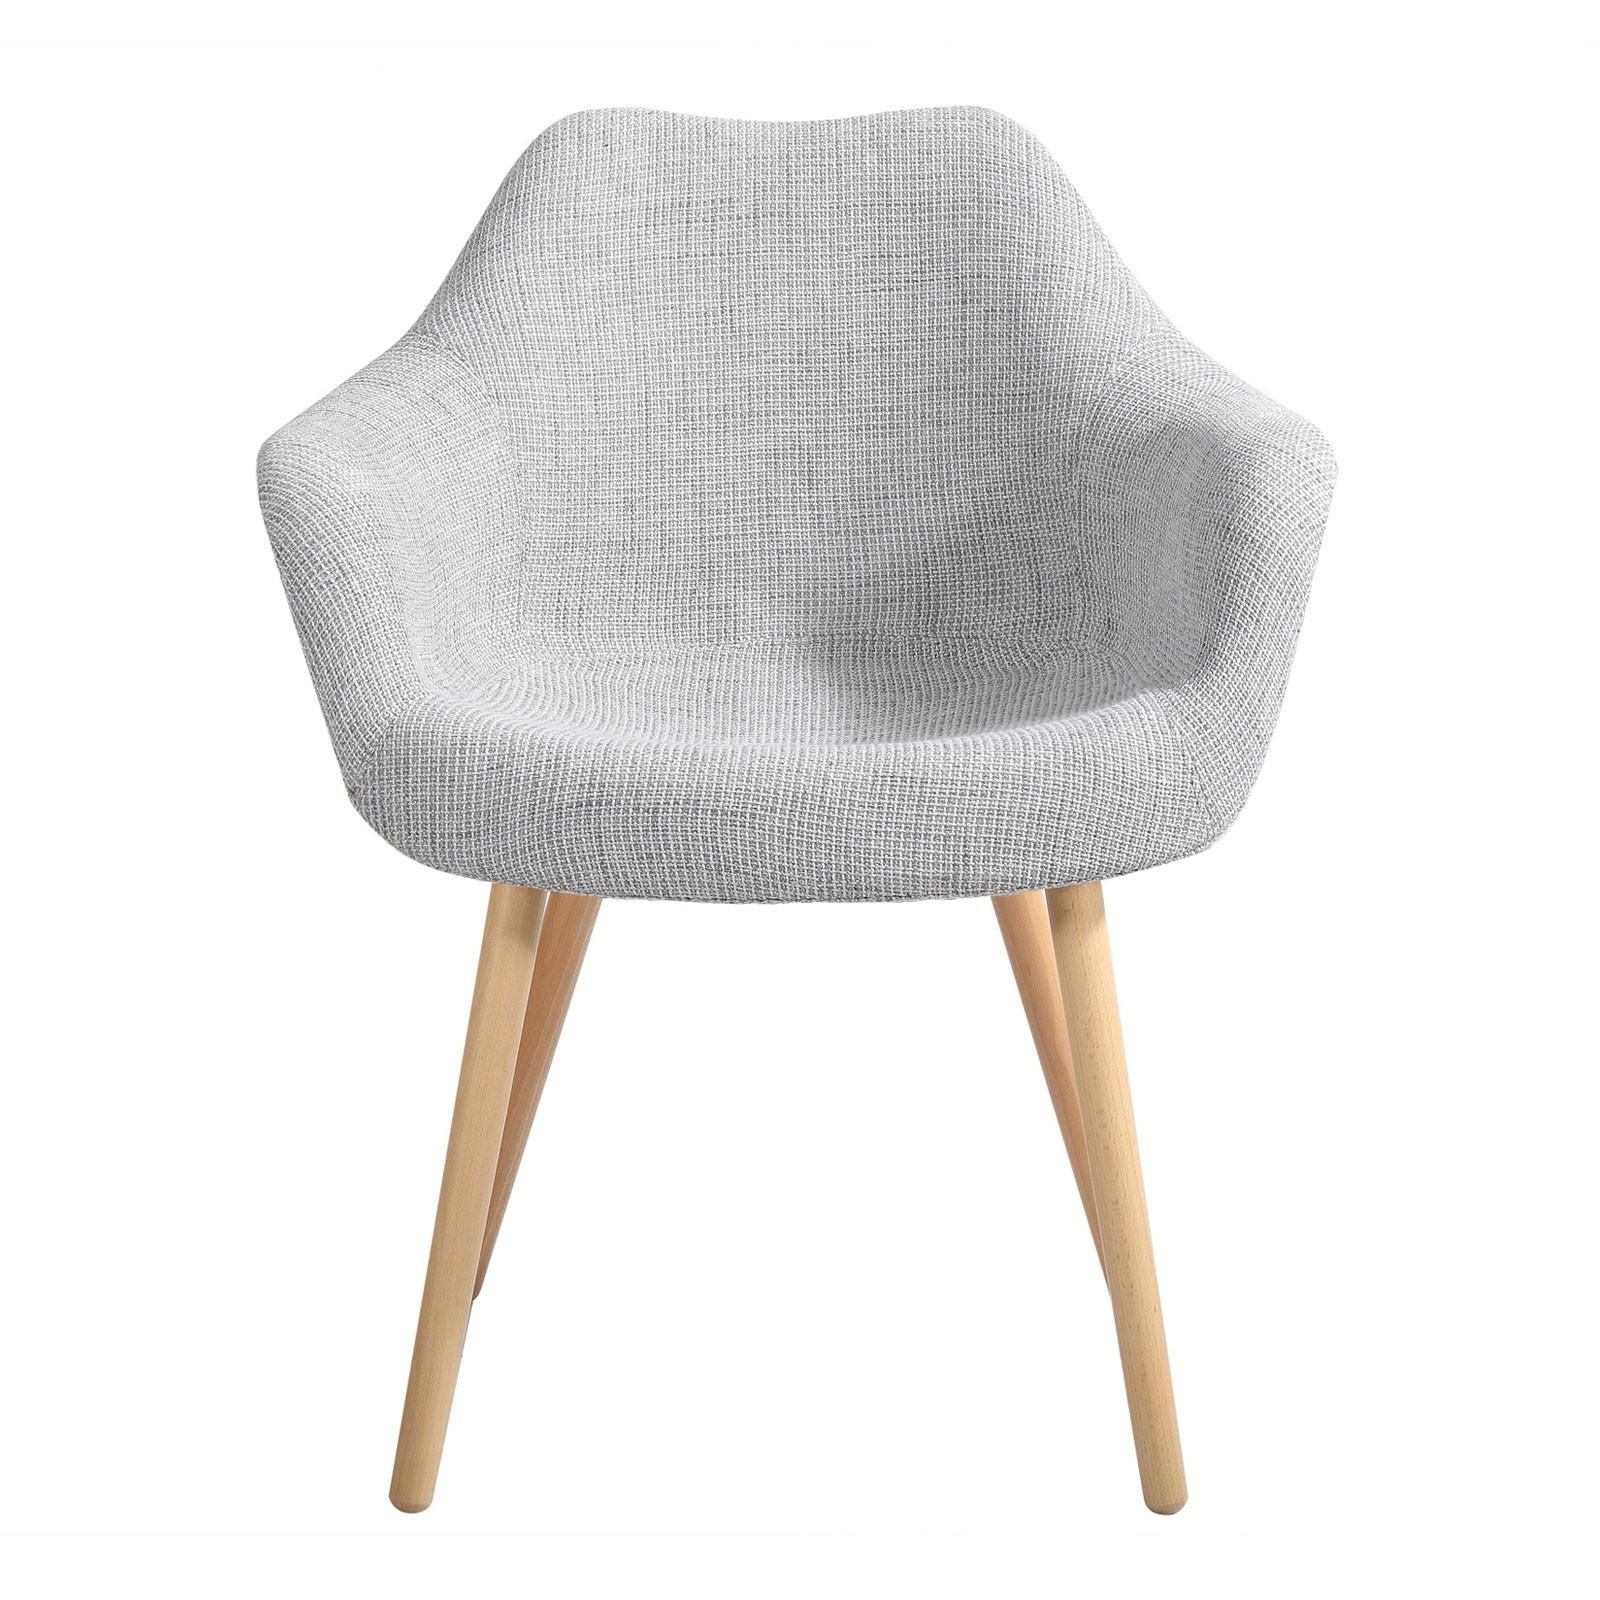 Chaise Grise Tissu – Design  la maison